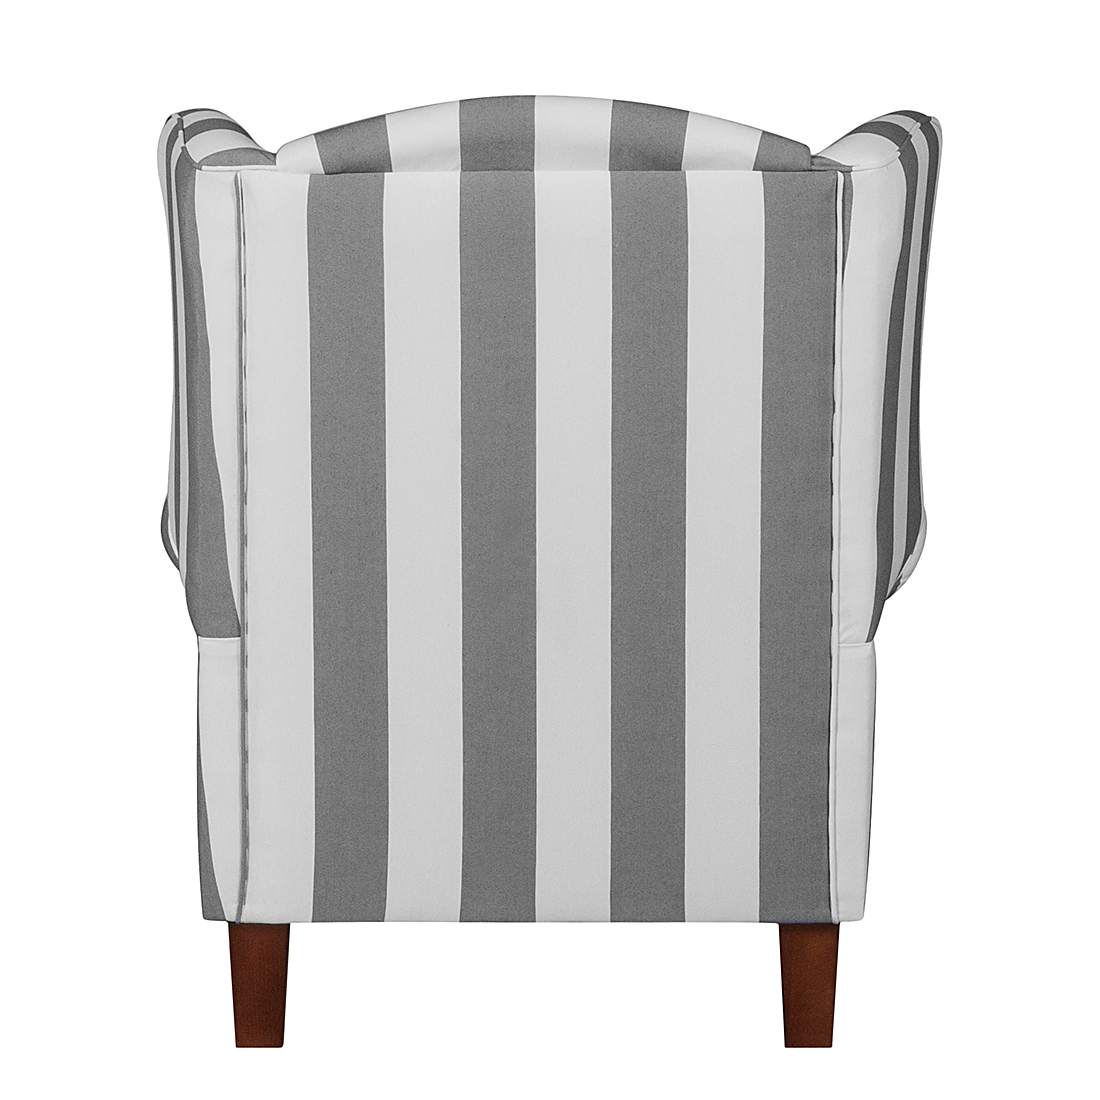 ohrensessel gestreift sessel gestreift new relaxsessel york phnix schner leben high definition. Black Bedroom Furniture Sets. Home Design Ideas